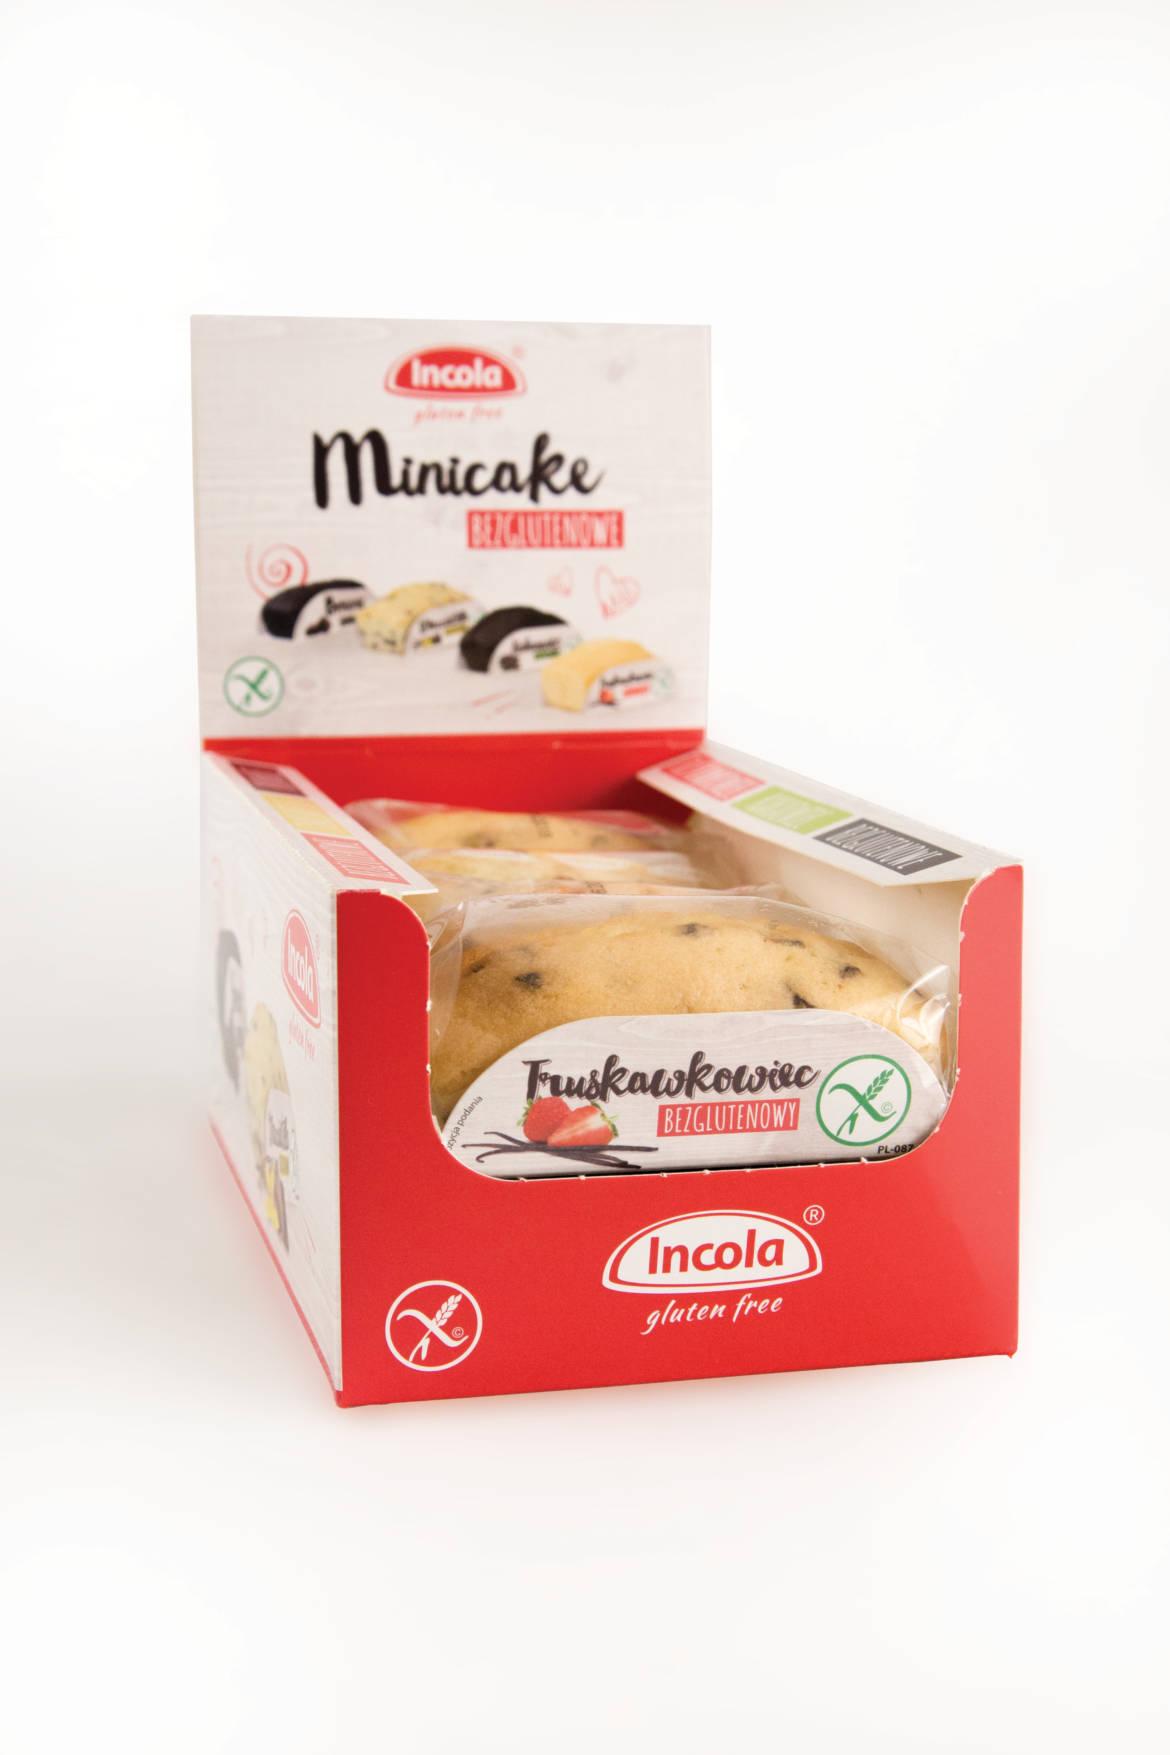 Minicake_Truskakowiec.jpg